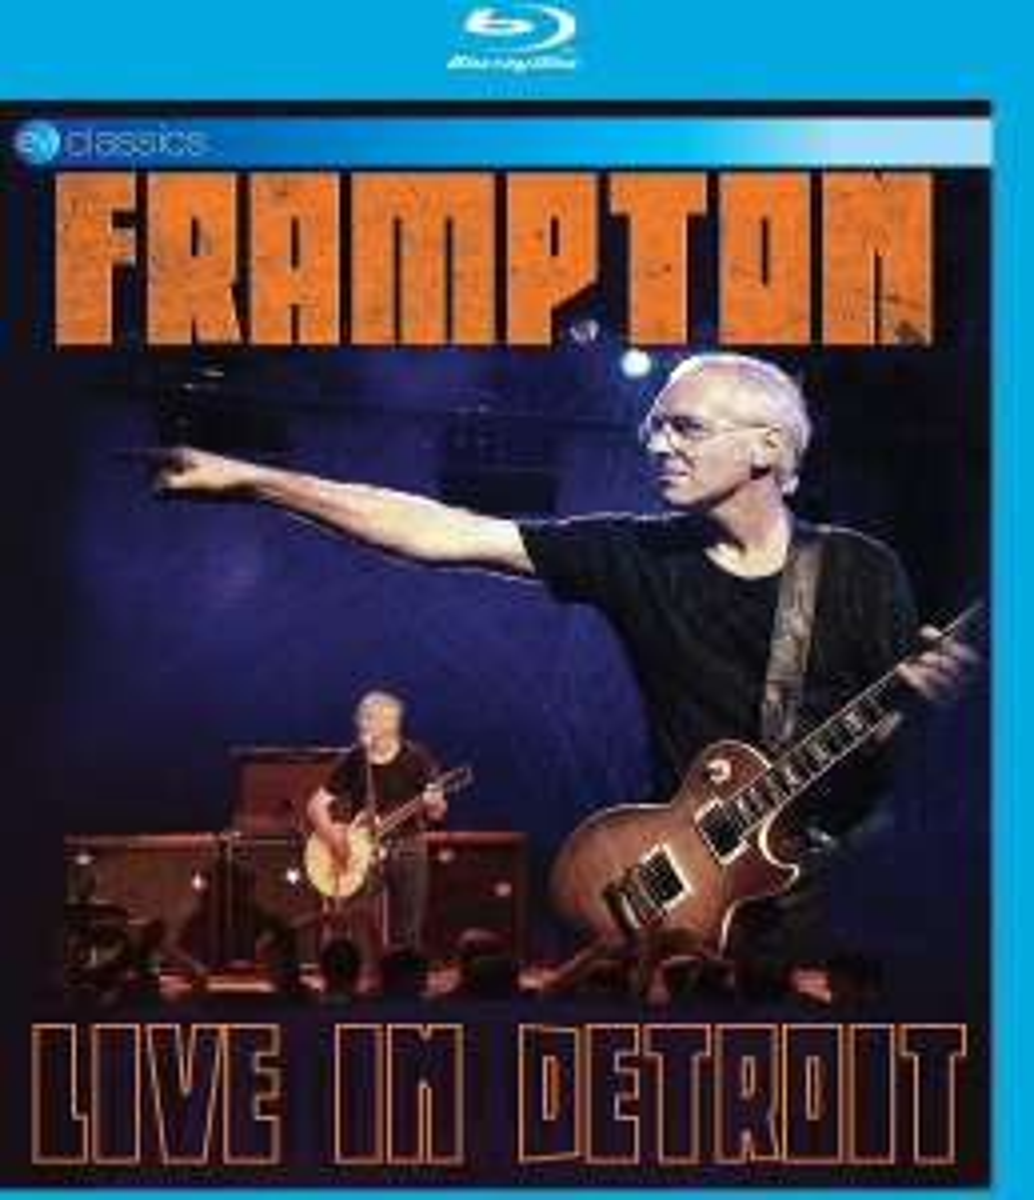 Peter Frampton - Live in Detroit (Blu-ray) für 5€ (Amazon Prime & Saturn & Media Markt Abholung)